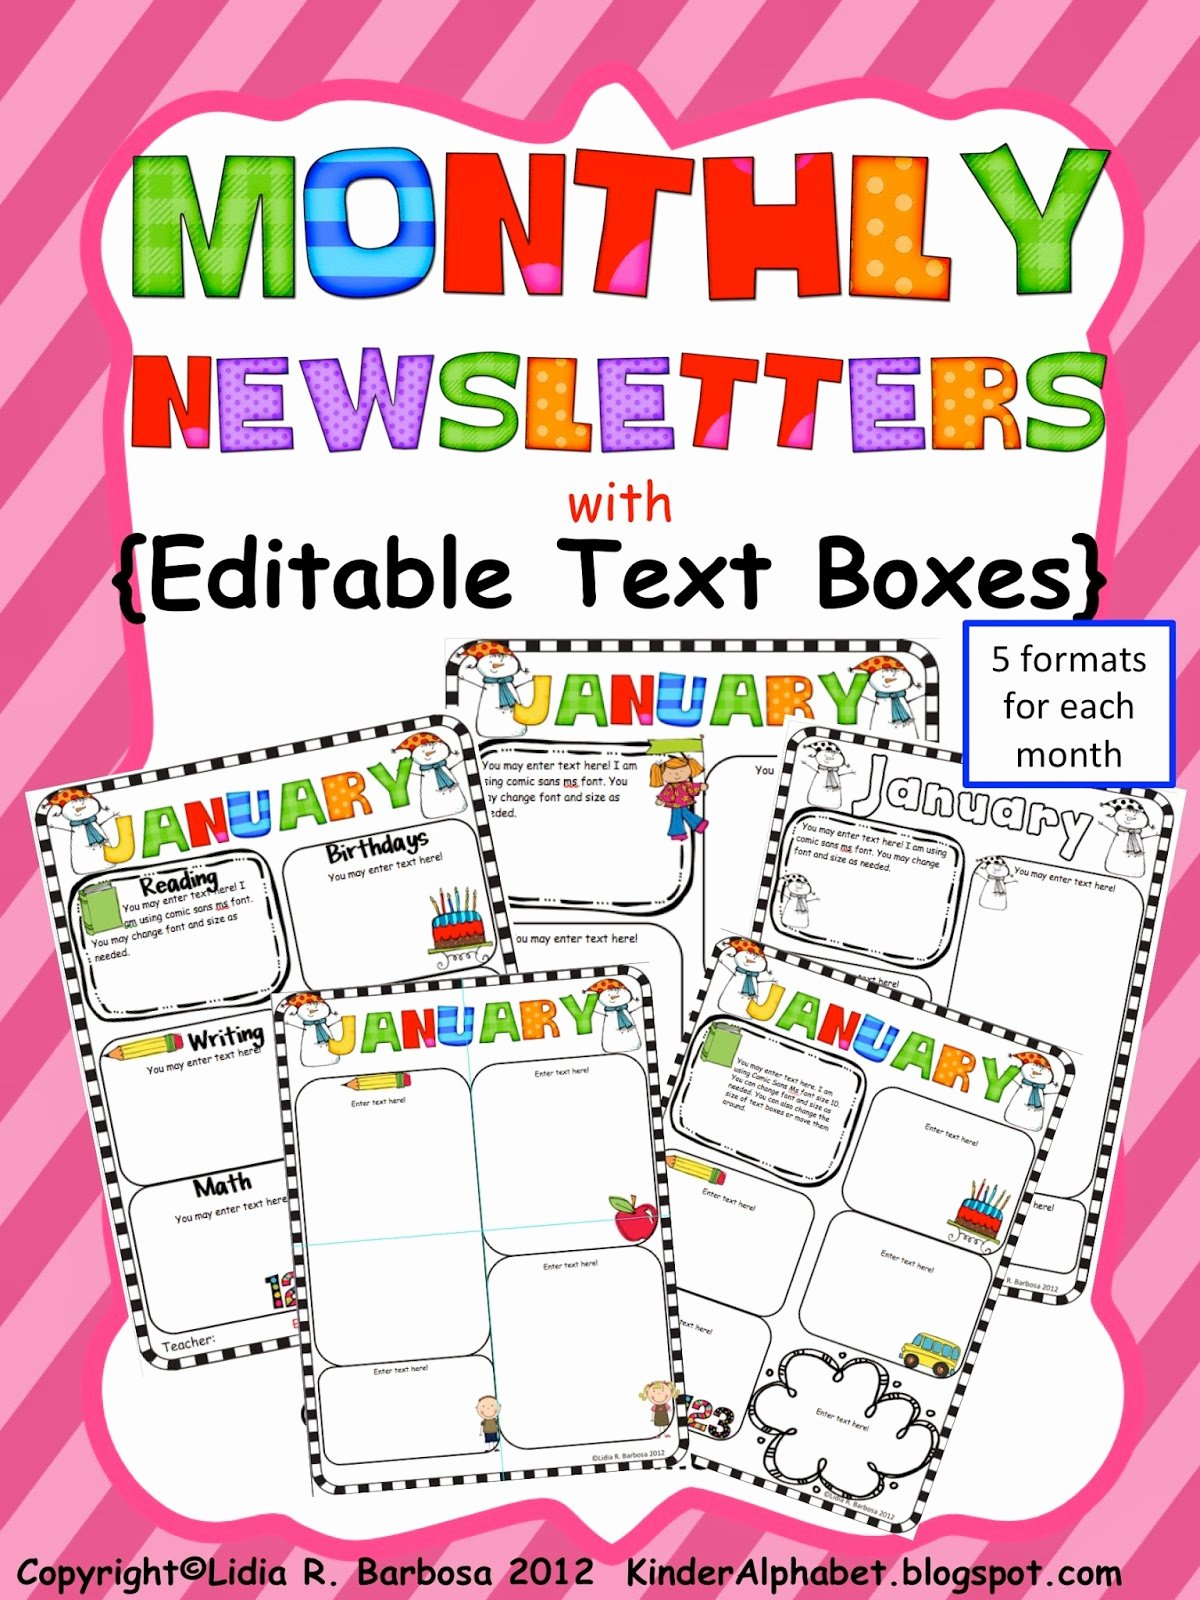 Kinder Alphabet — Teacher Resources In English and Spanish